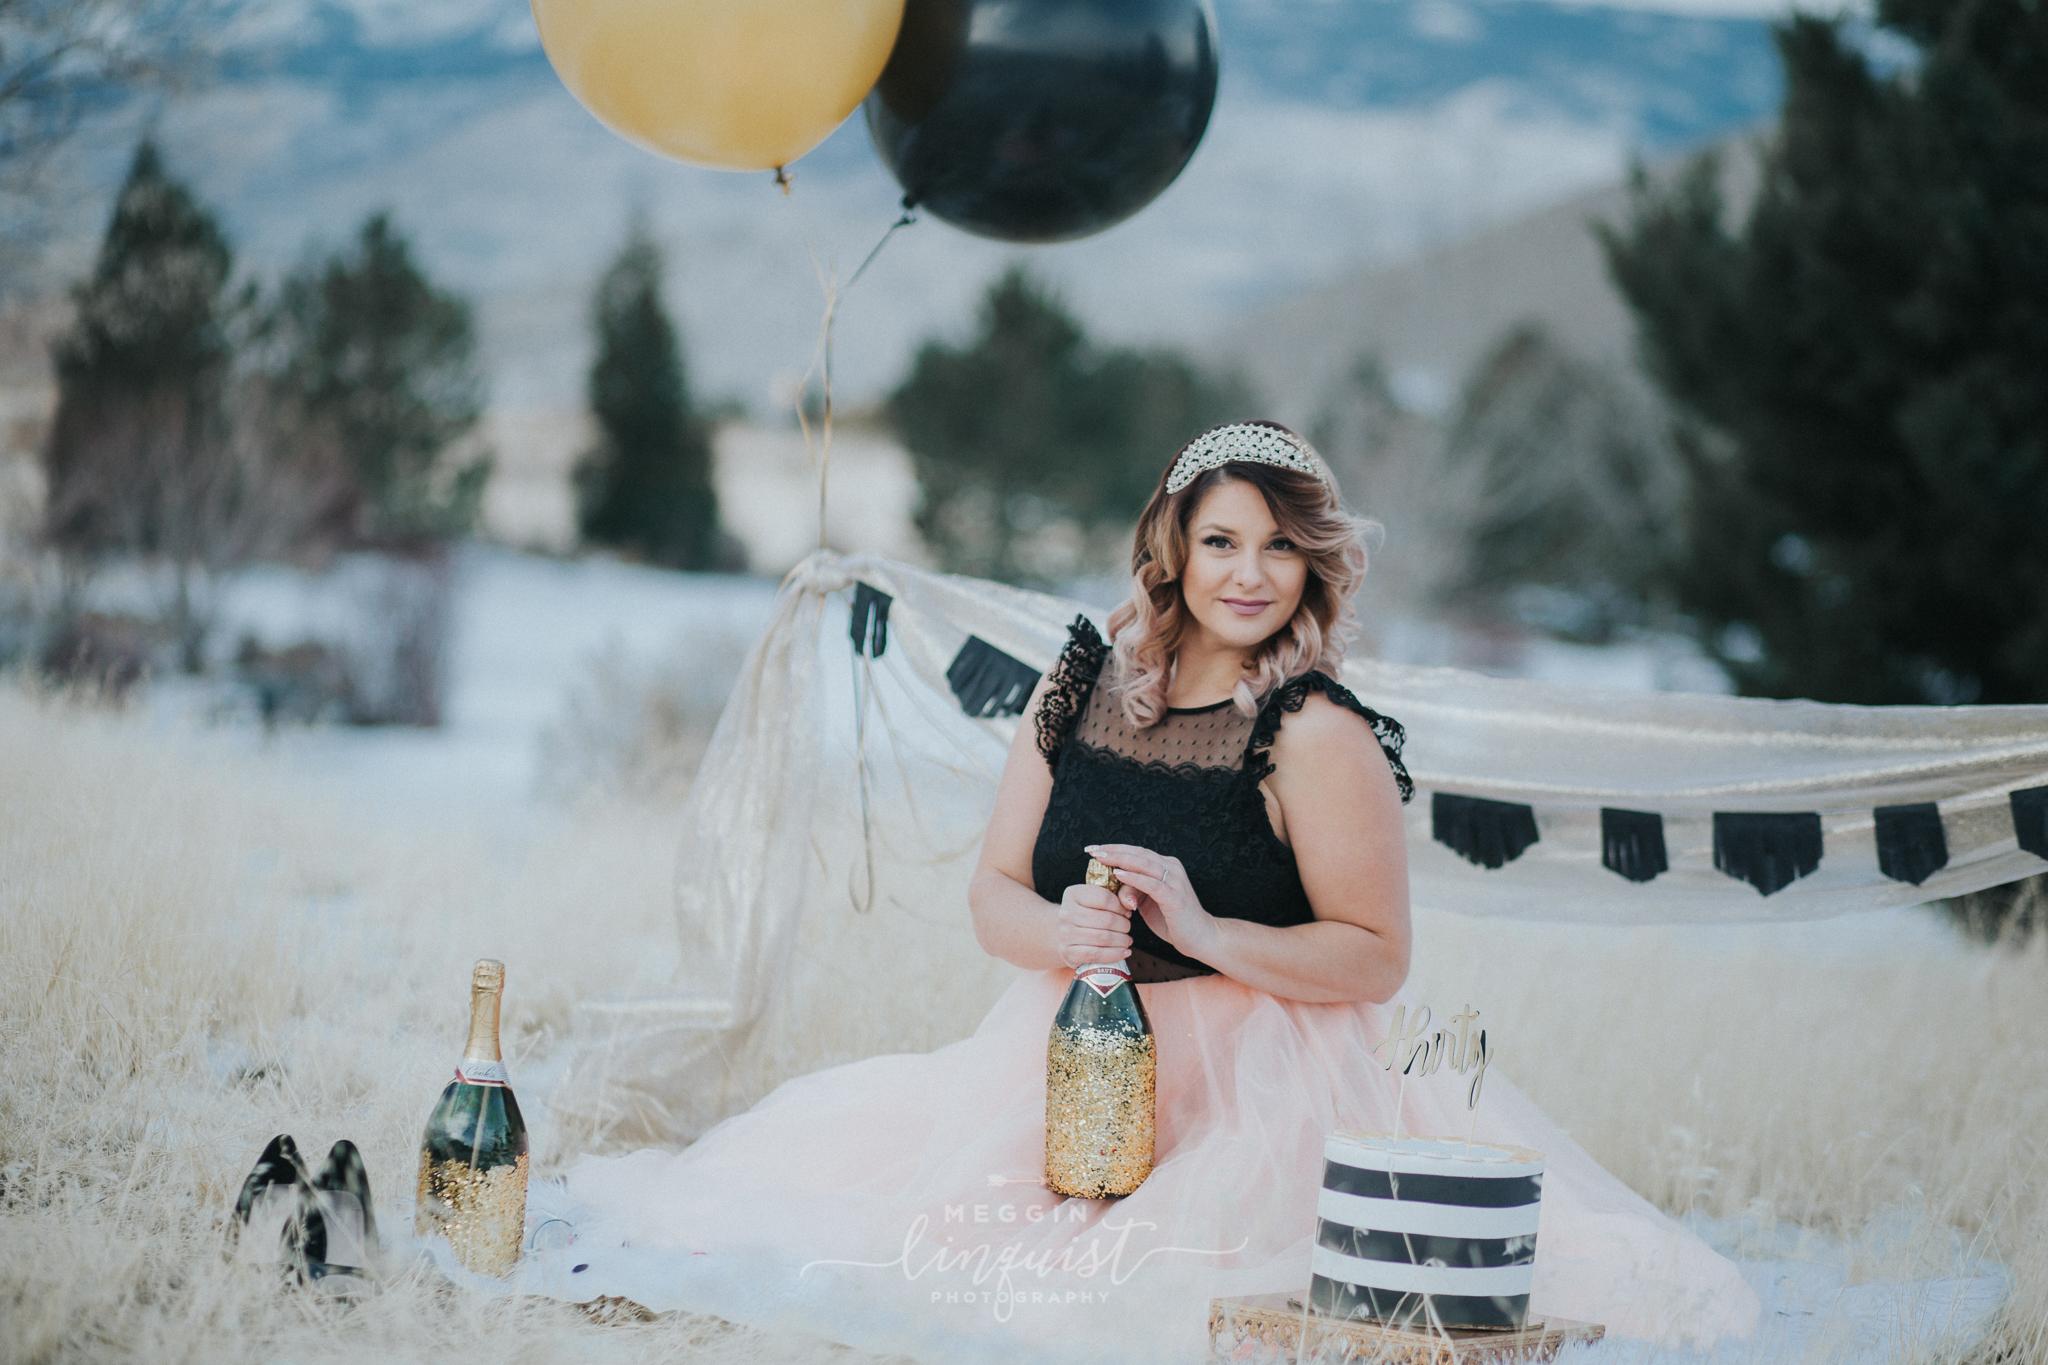 30th-birthday-cake-smash-reno-lake-tahoe-photographer-5.jpg